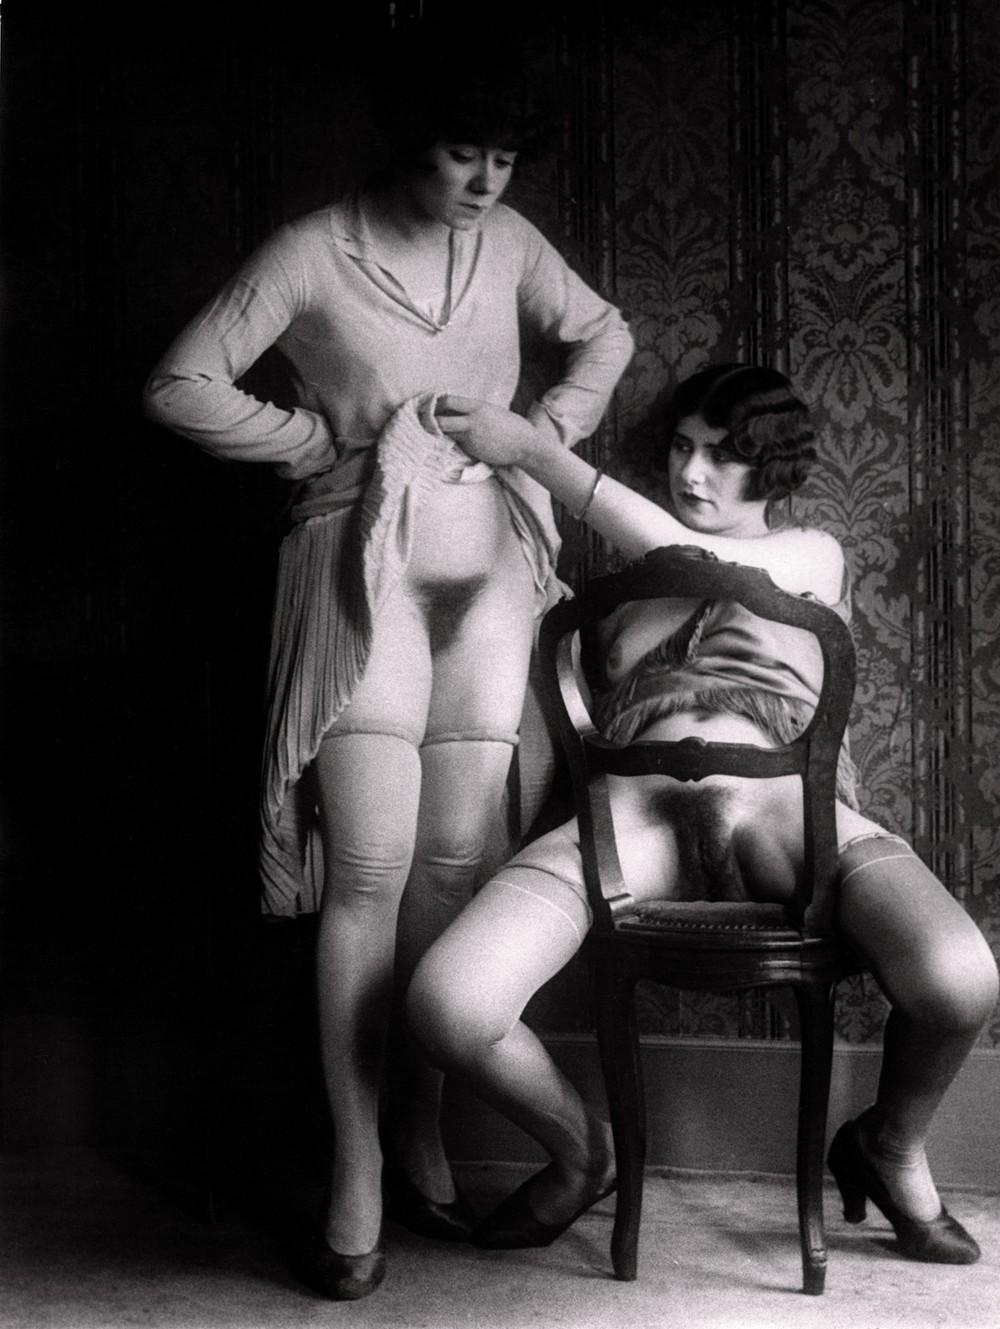 putas francesas prostitutas reales video